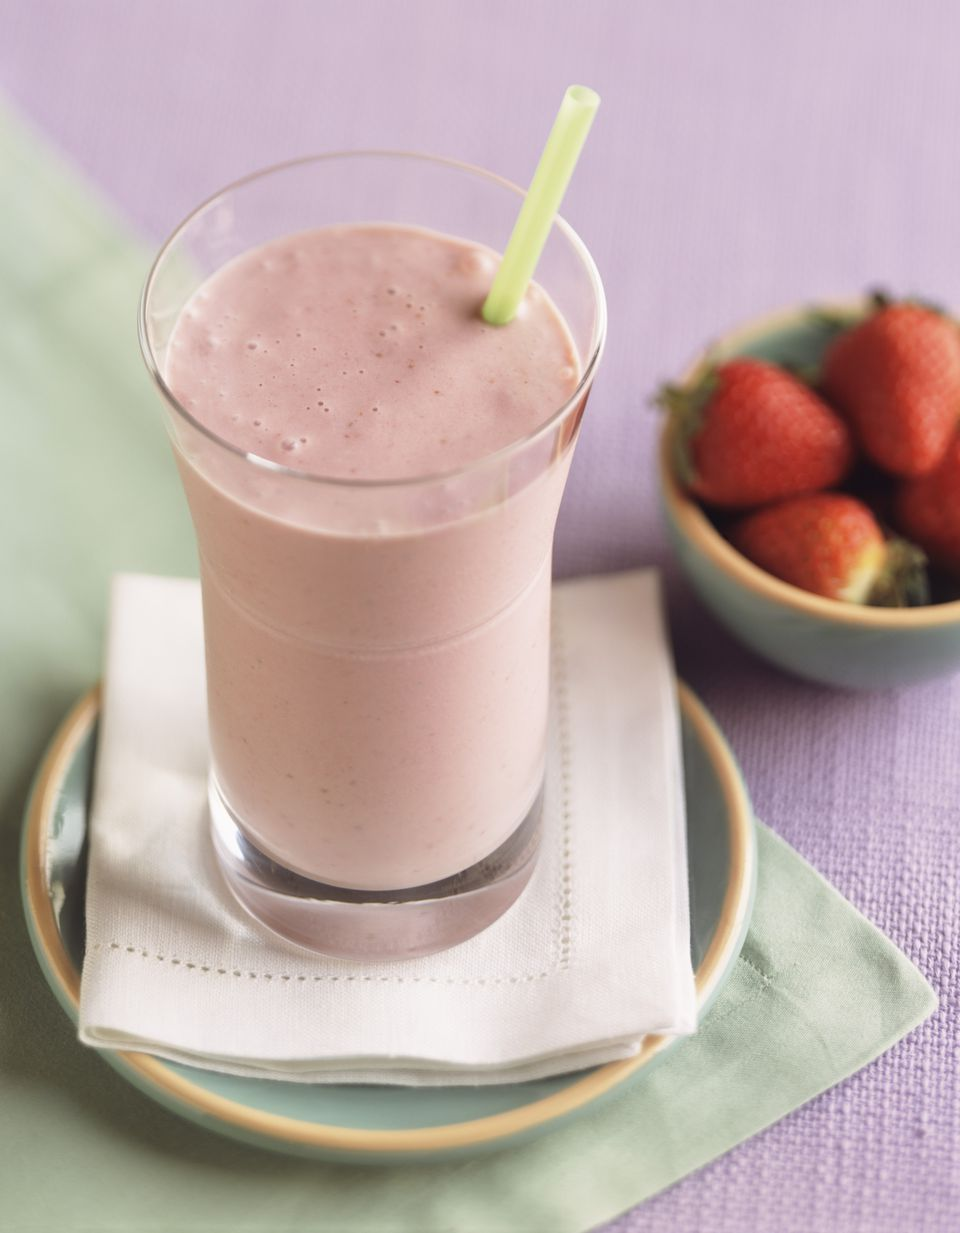 strawberry-creamy-smoothie-getty-2786-x-3577.jpg